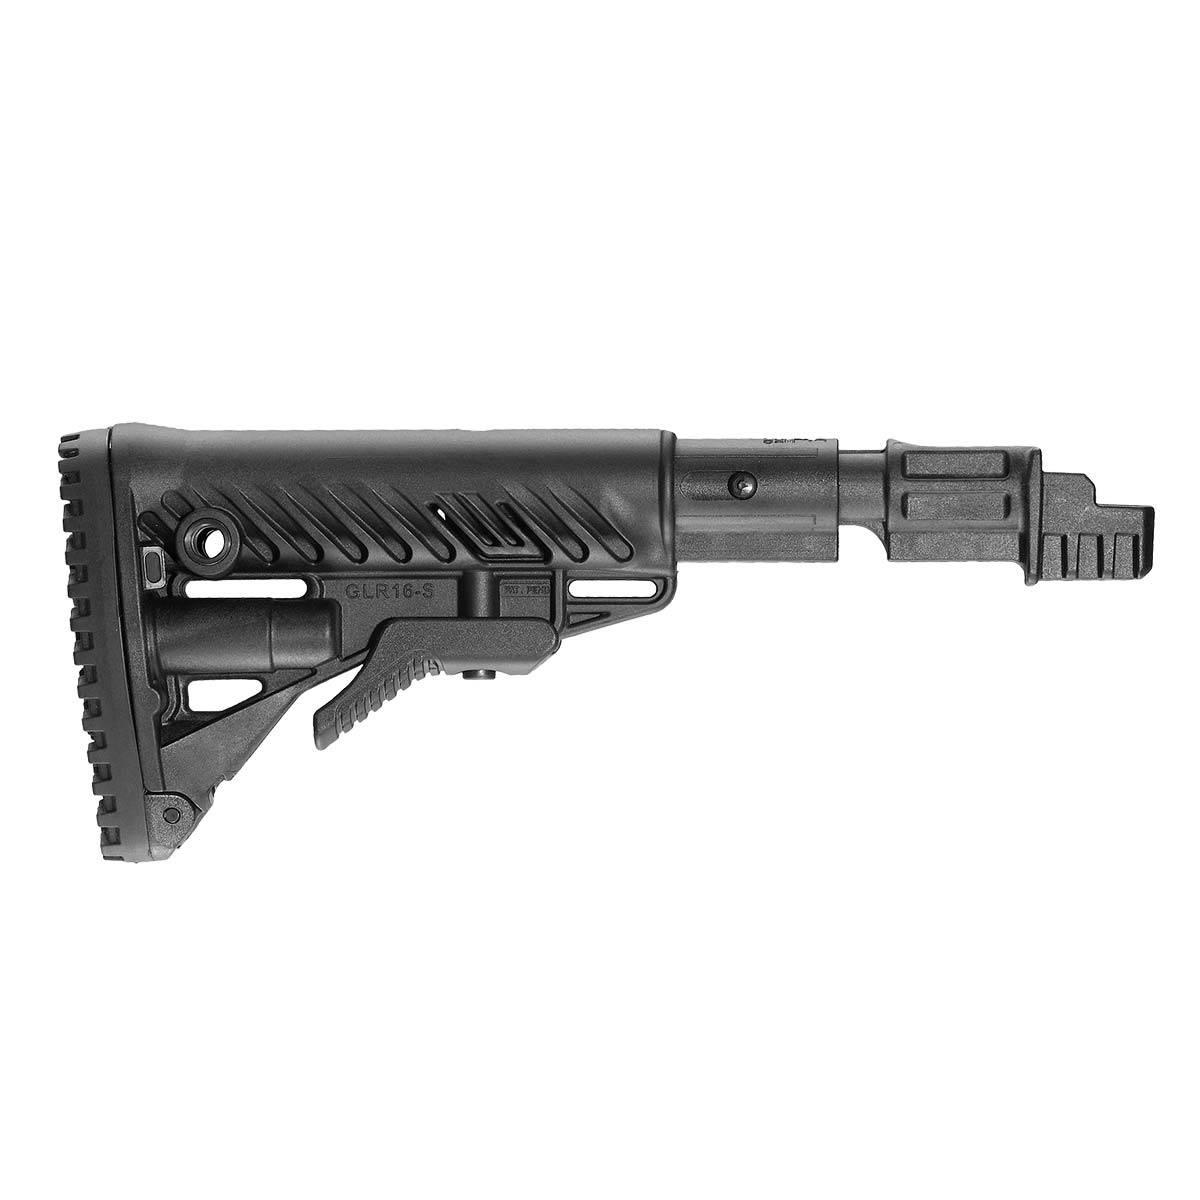 fab-defense-shock-absorbing-ak-47-buffer-tube-3